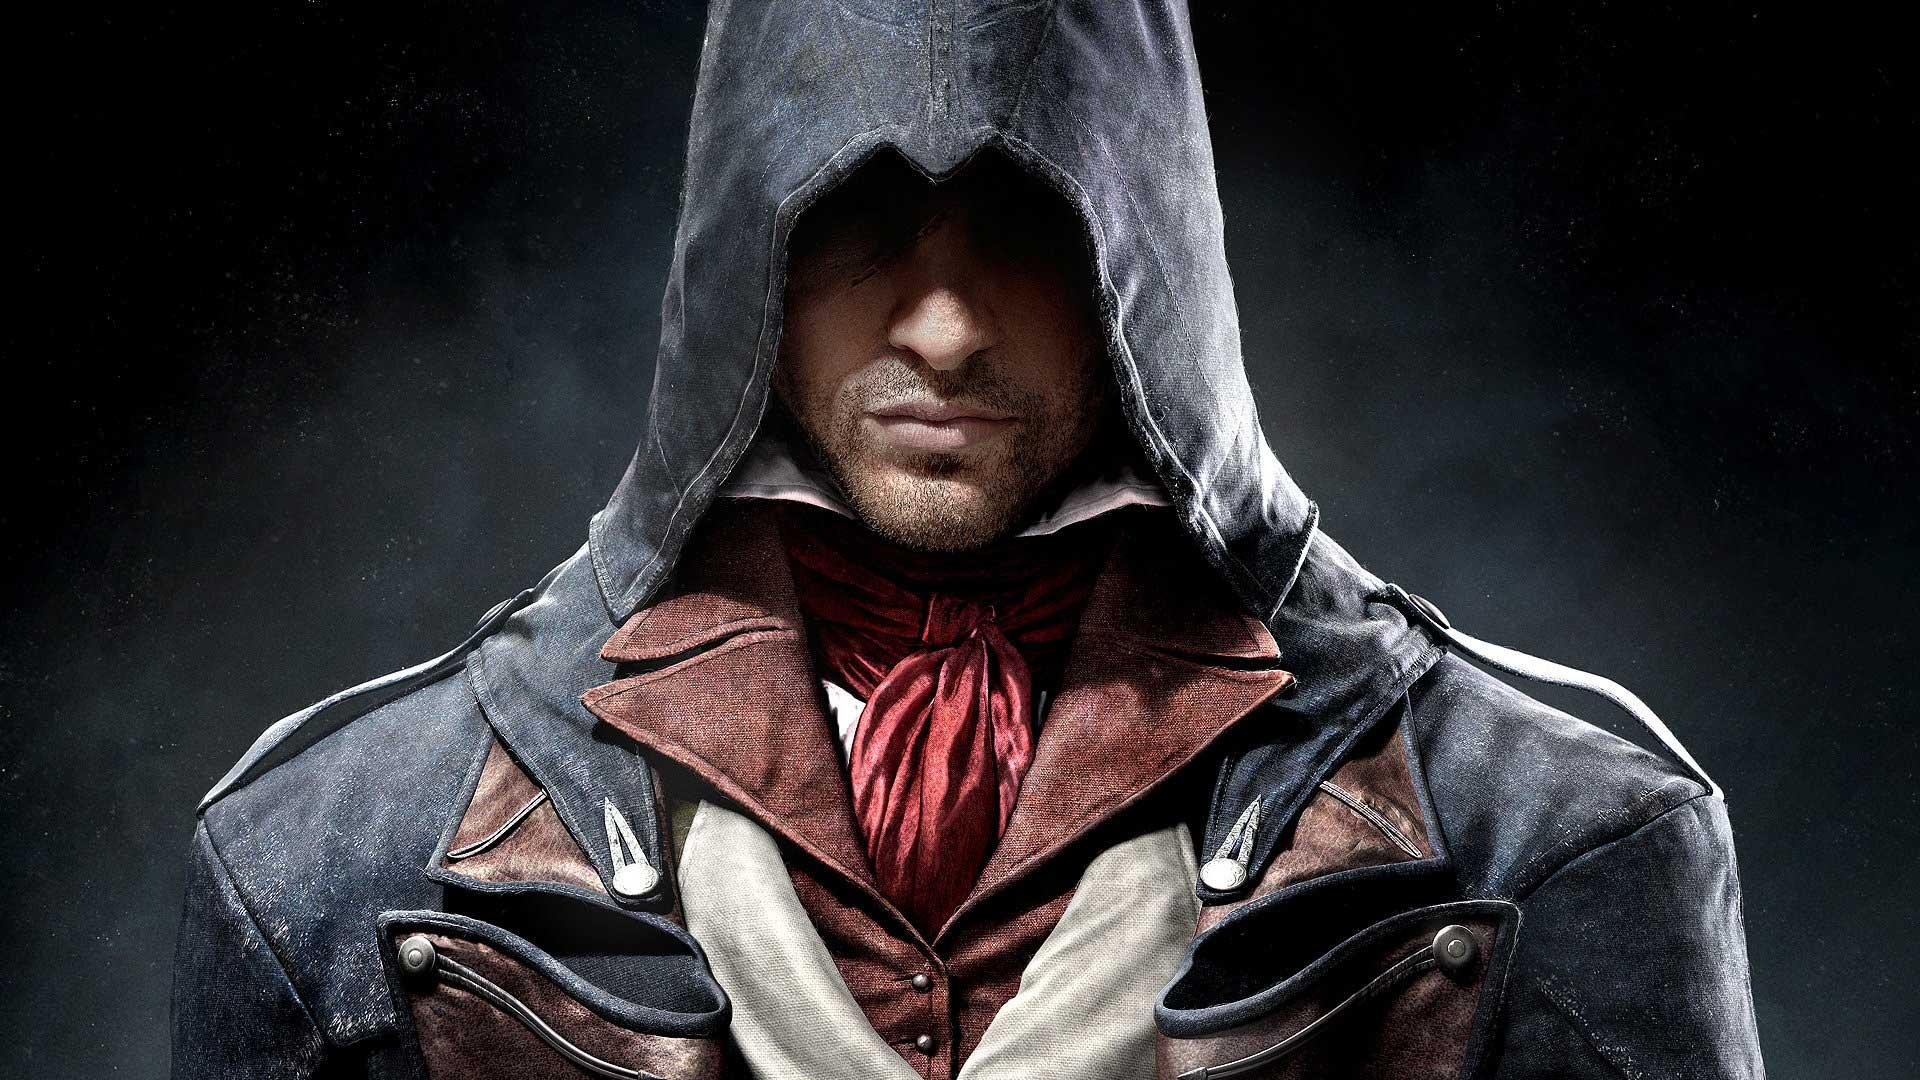 Руководство по загадке Нострадамуса в игре Assassin's Creed Unity (Финал)